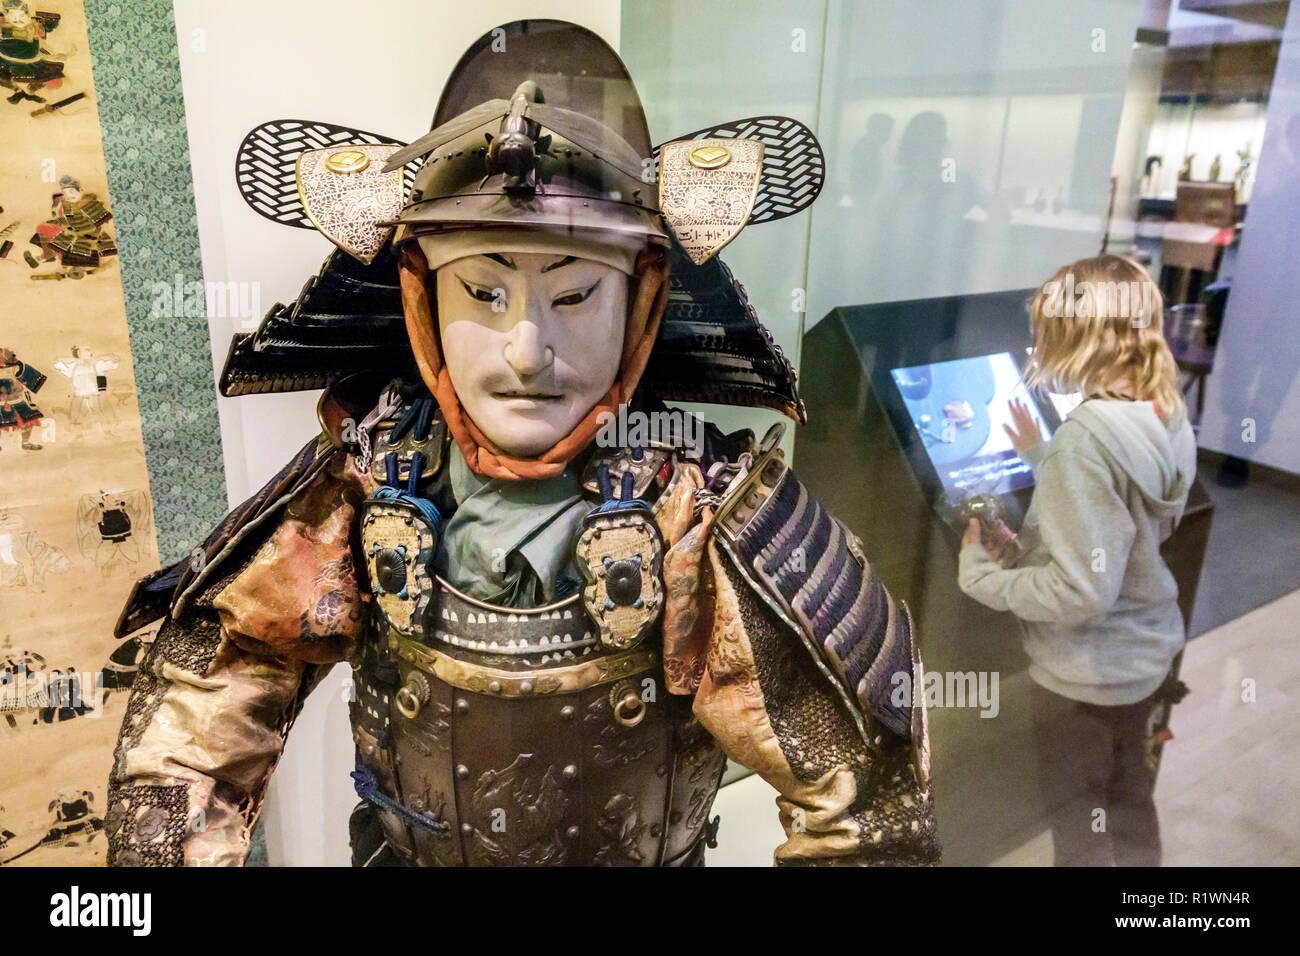 London England United Kingdom Great Britain Knightsbridge Victoria and & Albert Museum V&A V & Agalle inside interior Asia Collection samurai figure d - Stock Image